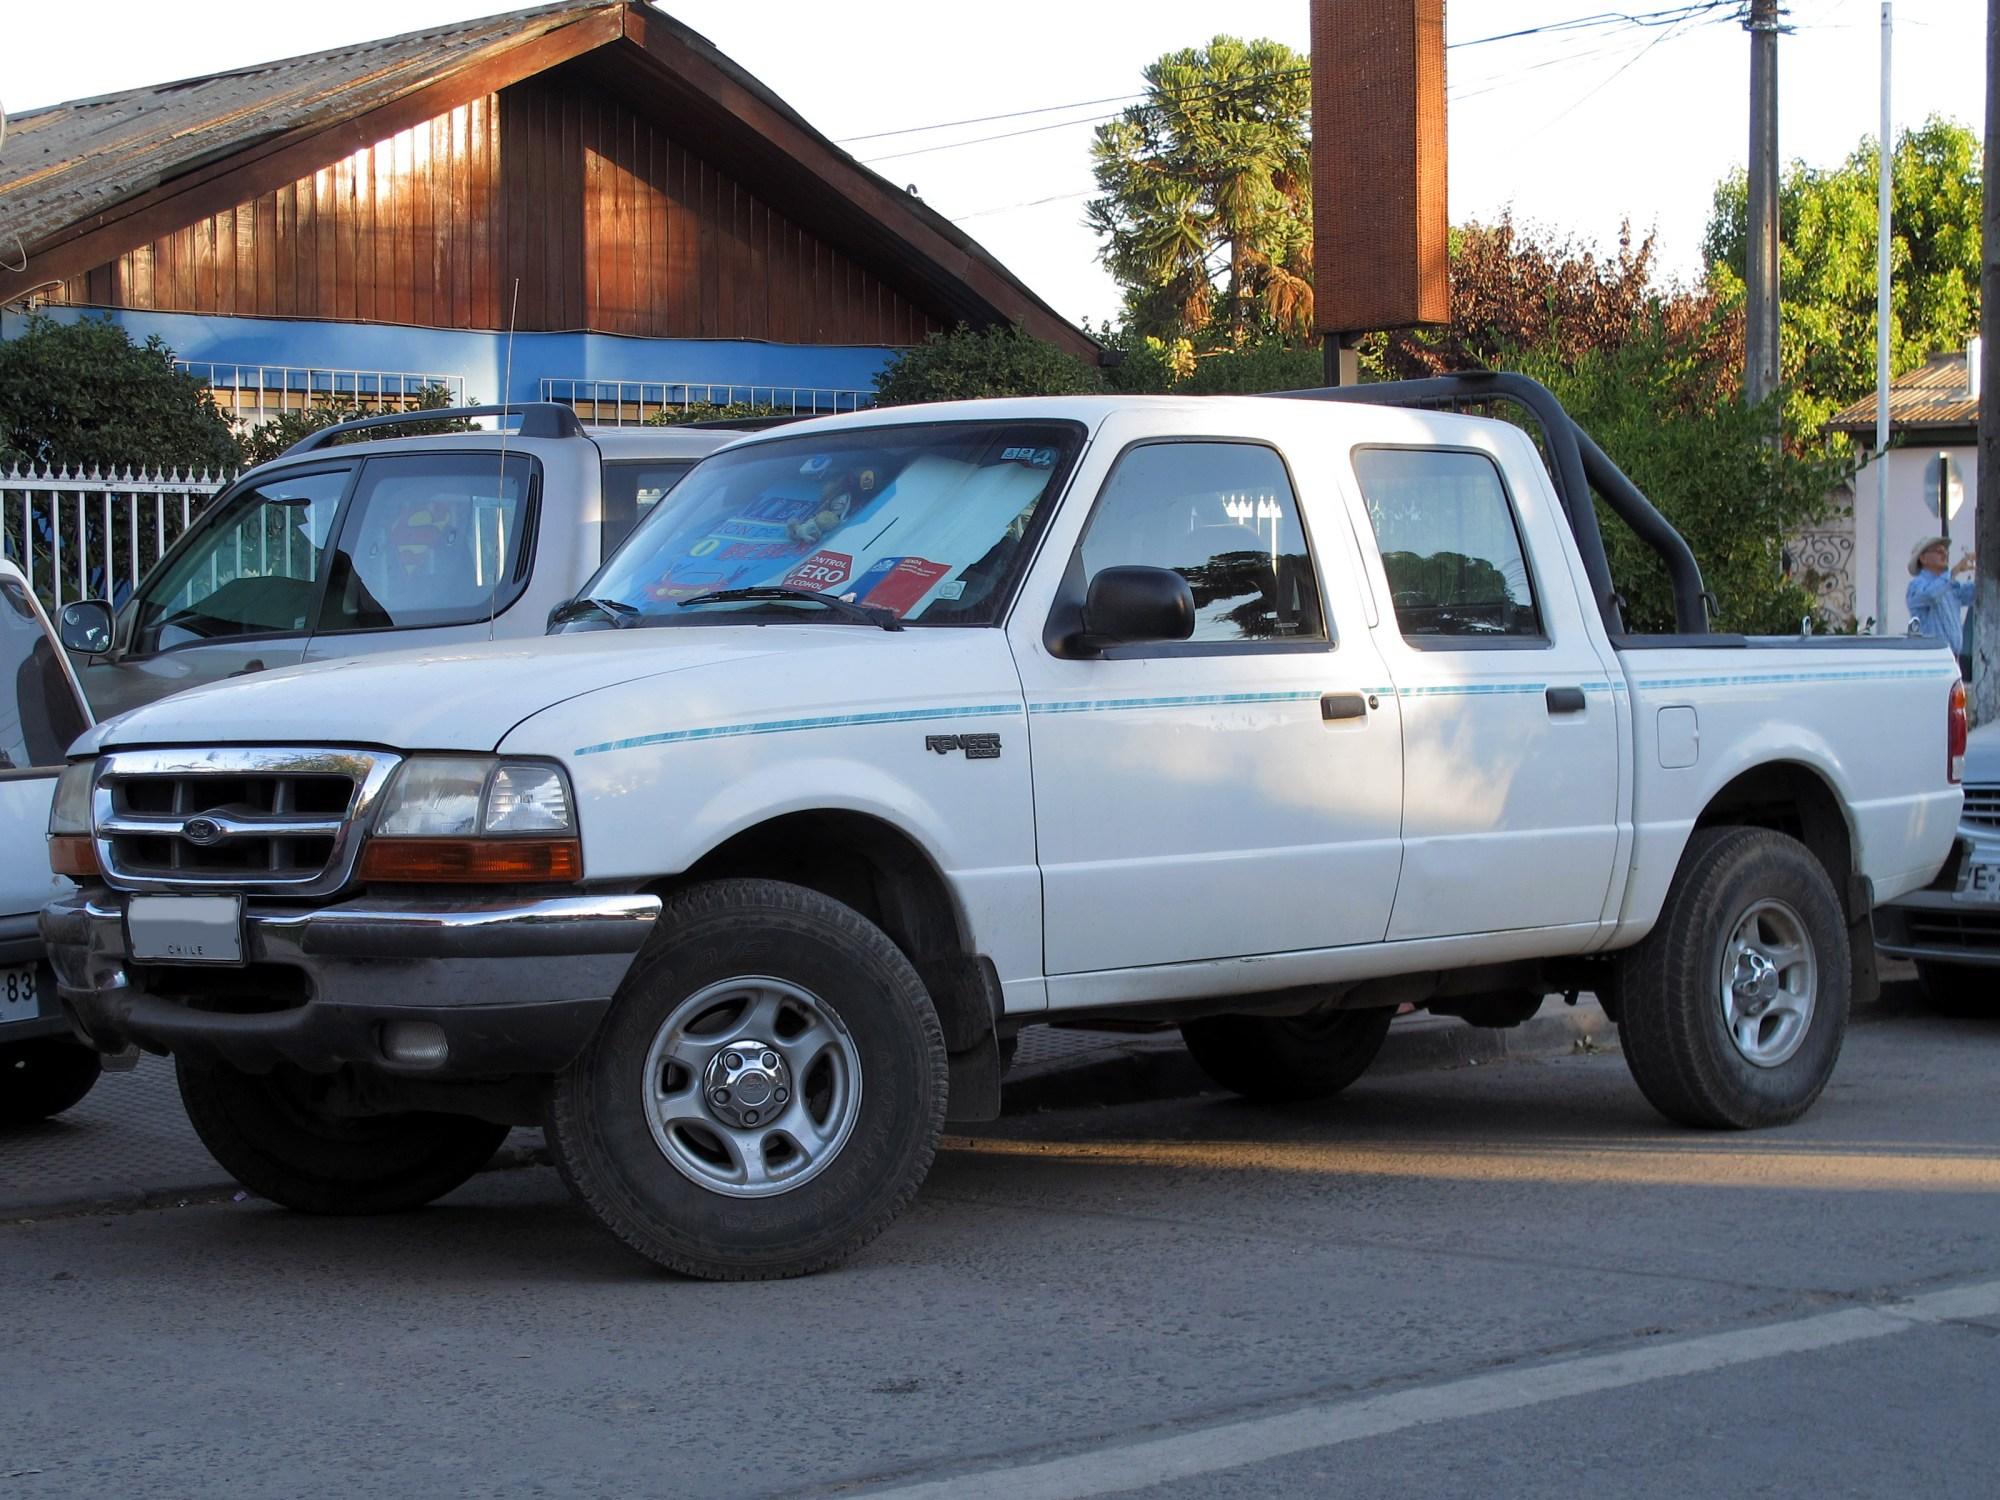 hight resolution of file ford ranger xlt 2 5 crew cab 1998 16680177057 jpg